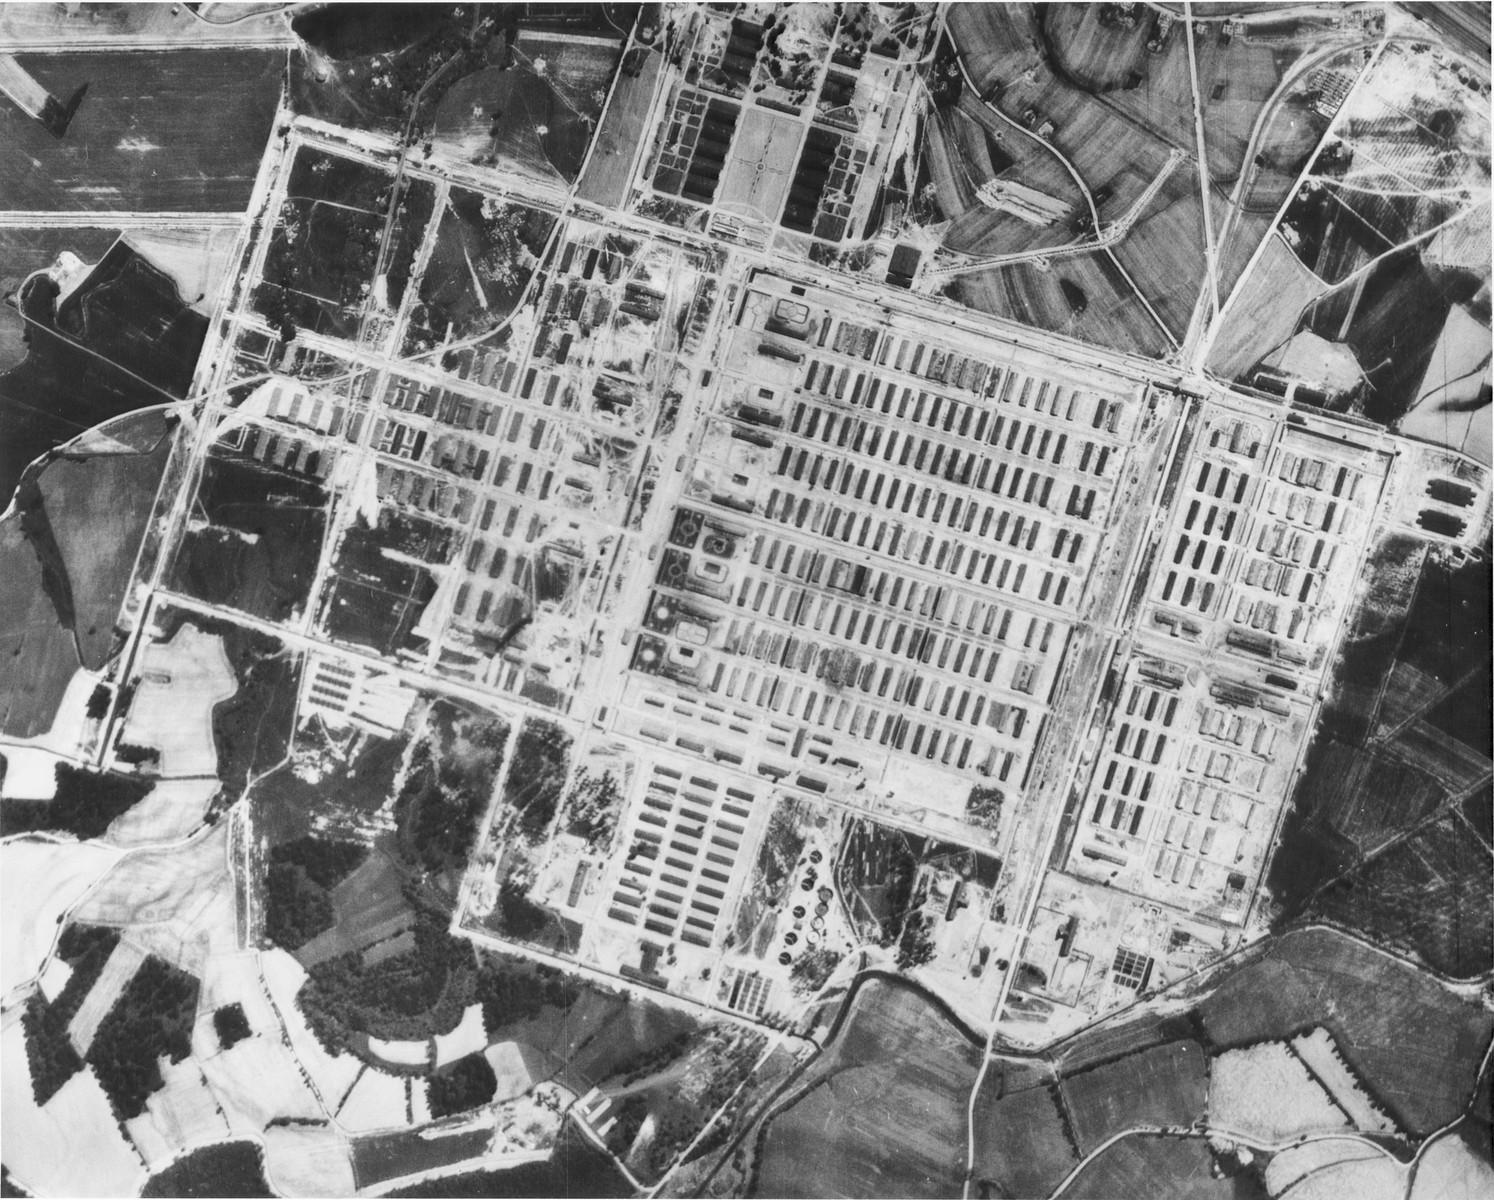 An aerial reconnaissance view showing the Auschwitz II (Birkenau) camp.